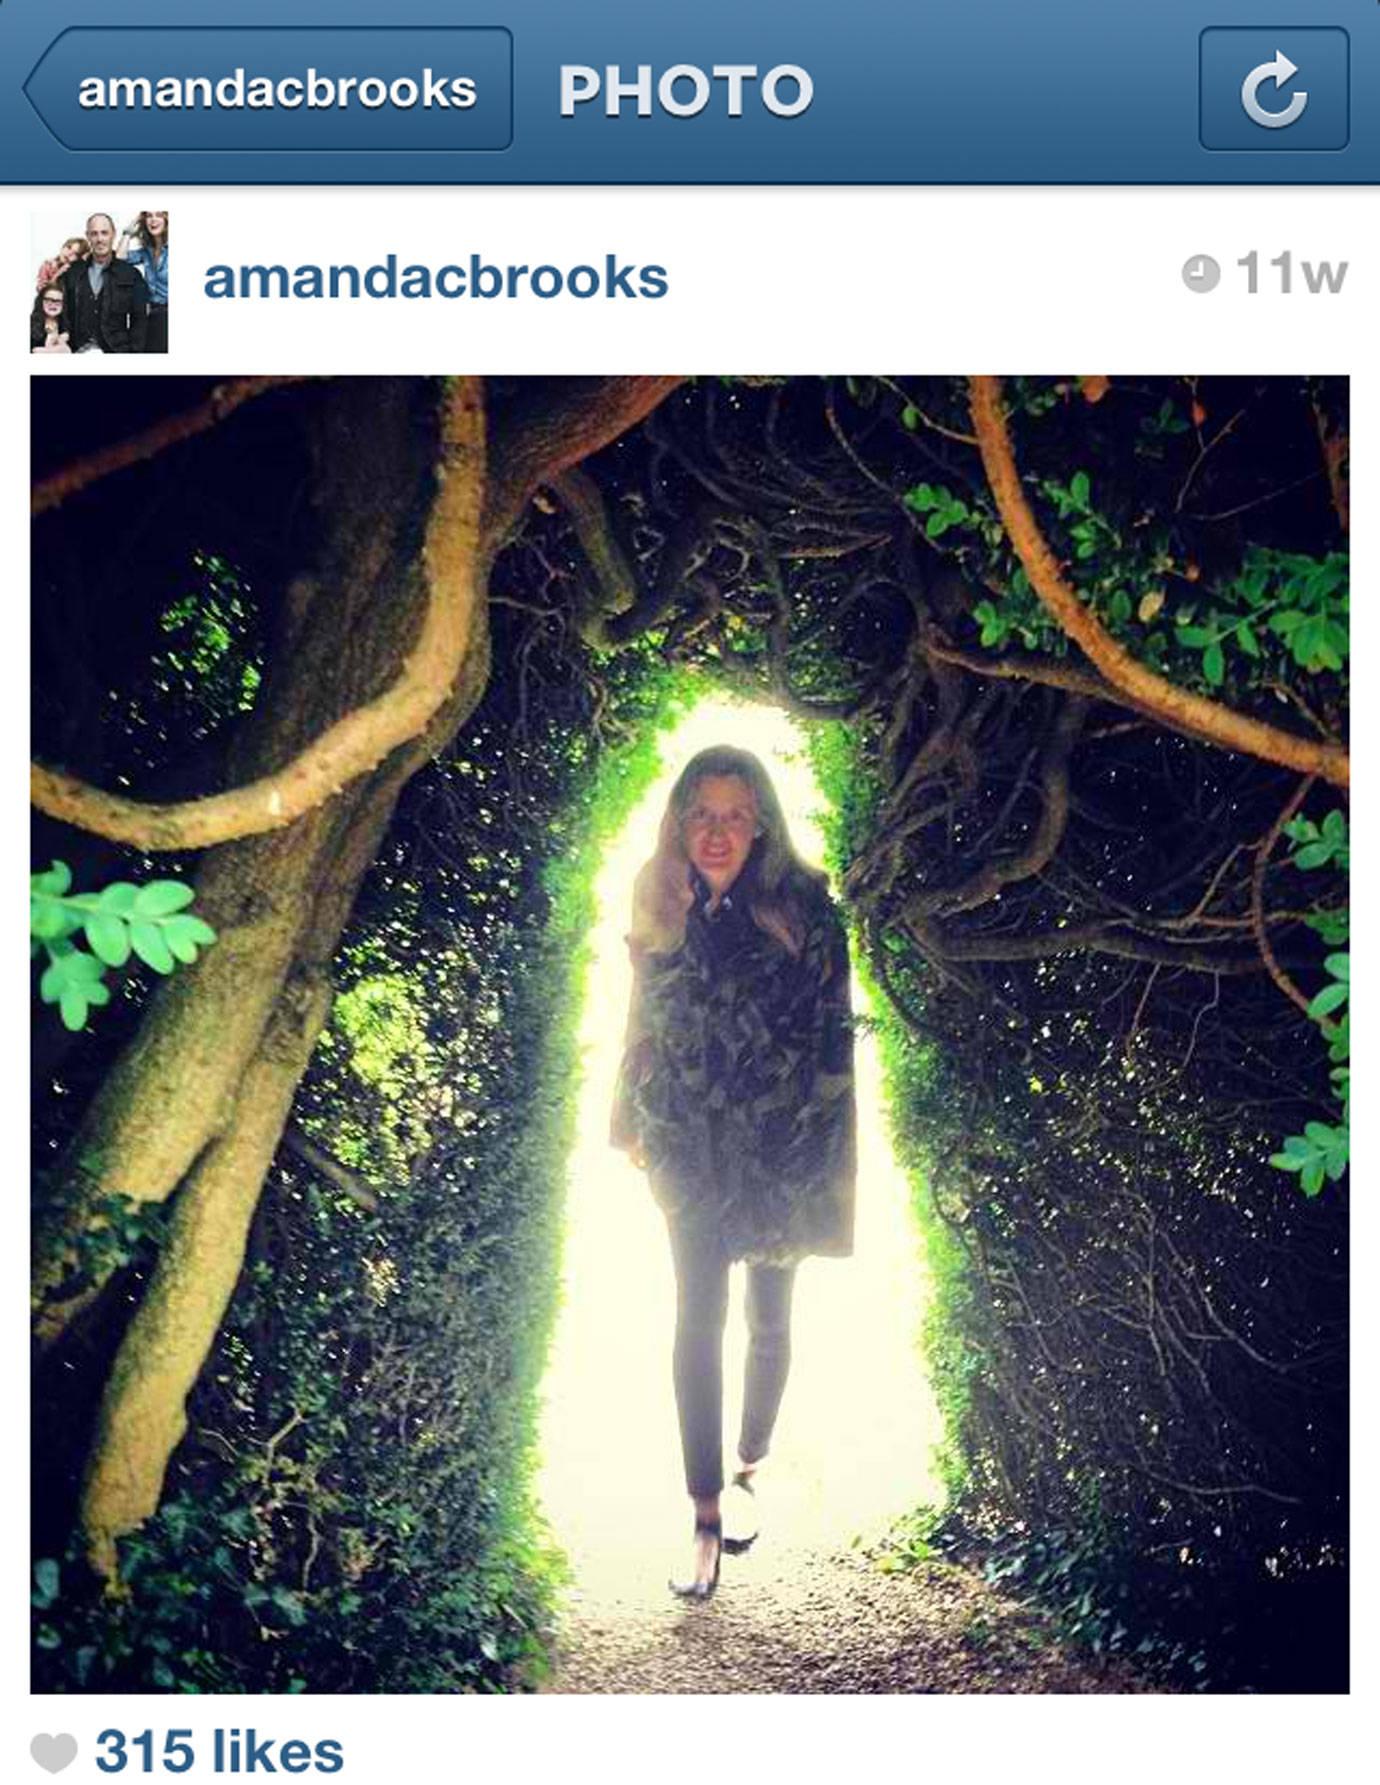 Celebrity instagram accounts johannes huebl for Amanda brooks instagram